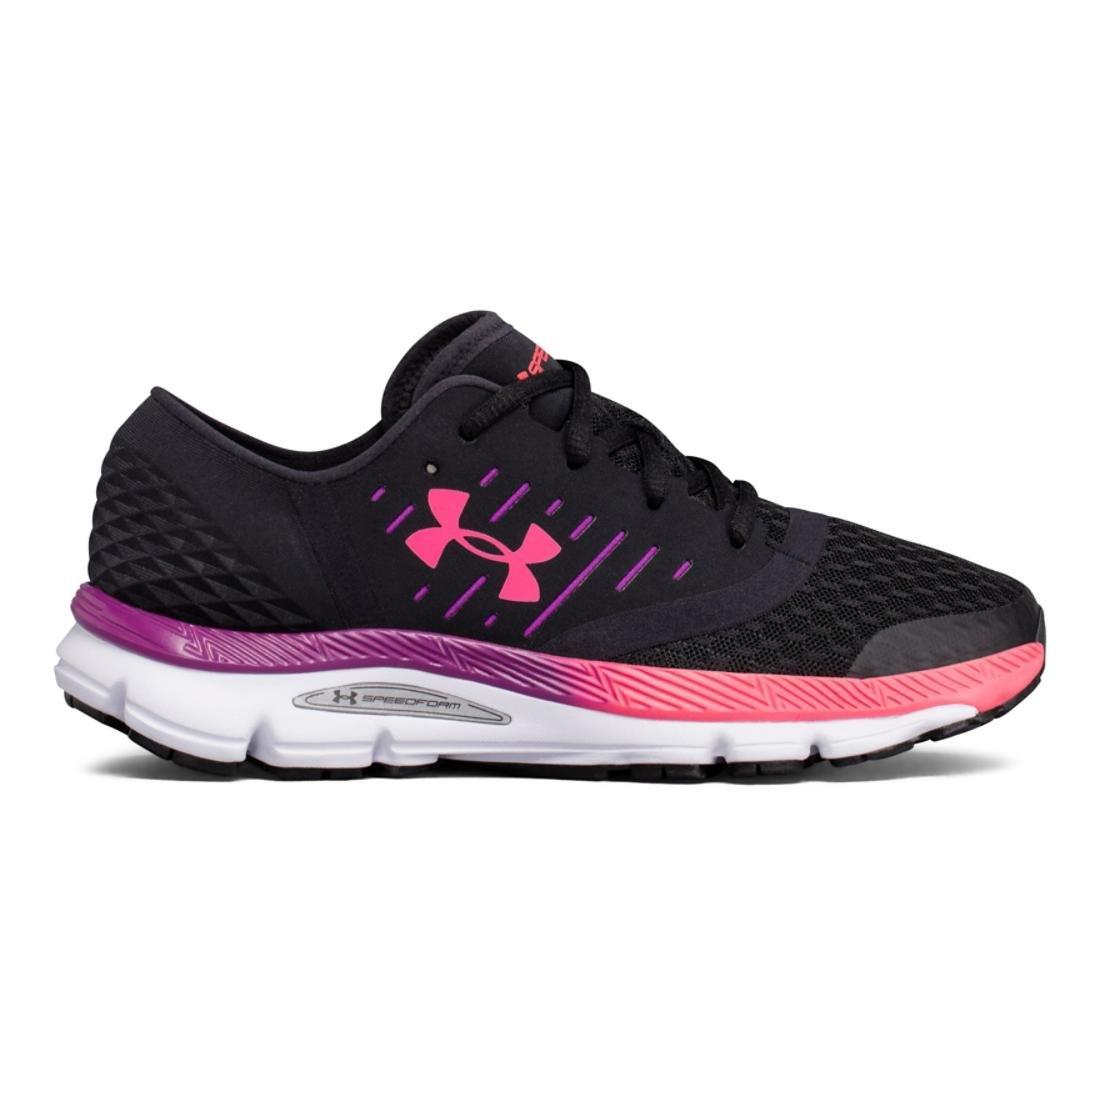 Under Armour Women's Speedform Intake Running Shoe, Black/Stealth Gray/White B01MRWR9GS 10 B(M) US|Black/Purple Rave/Penta Pink